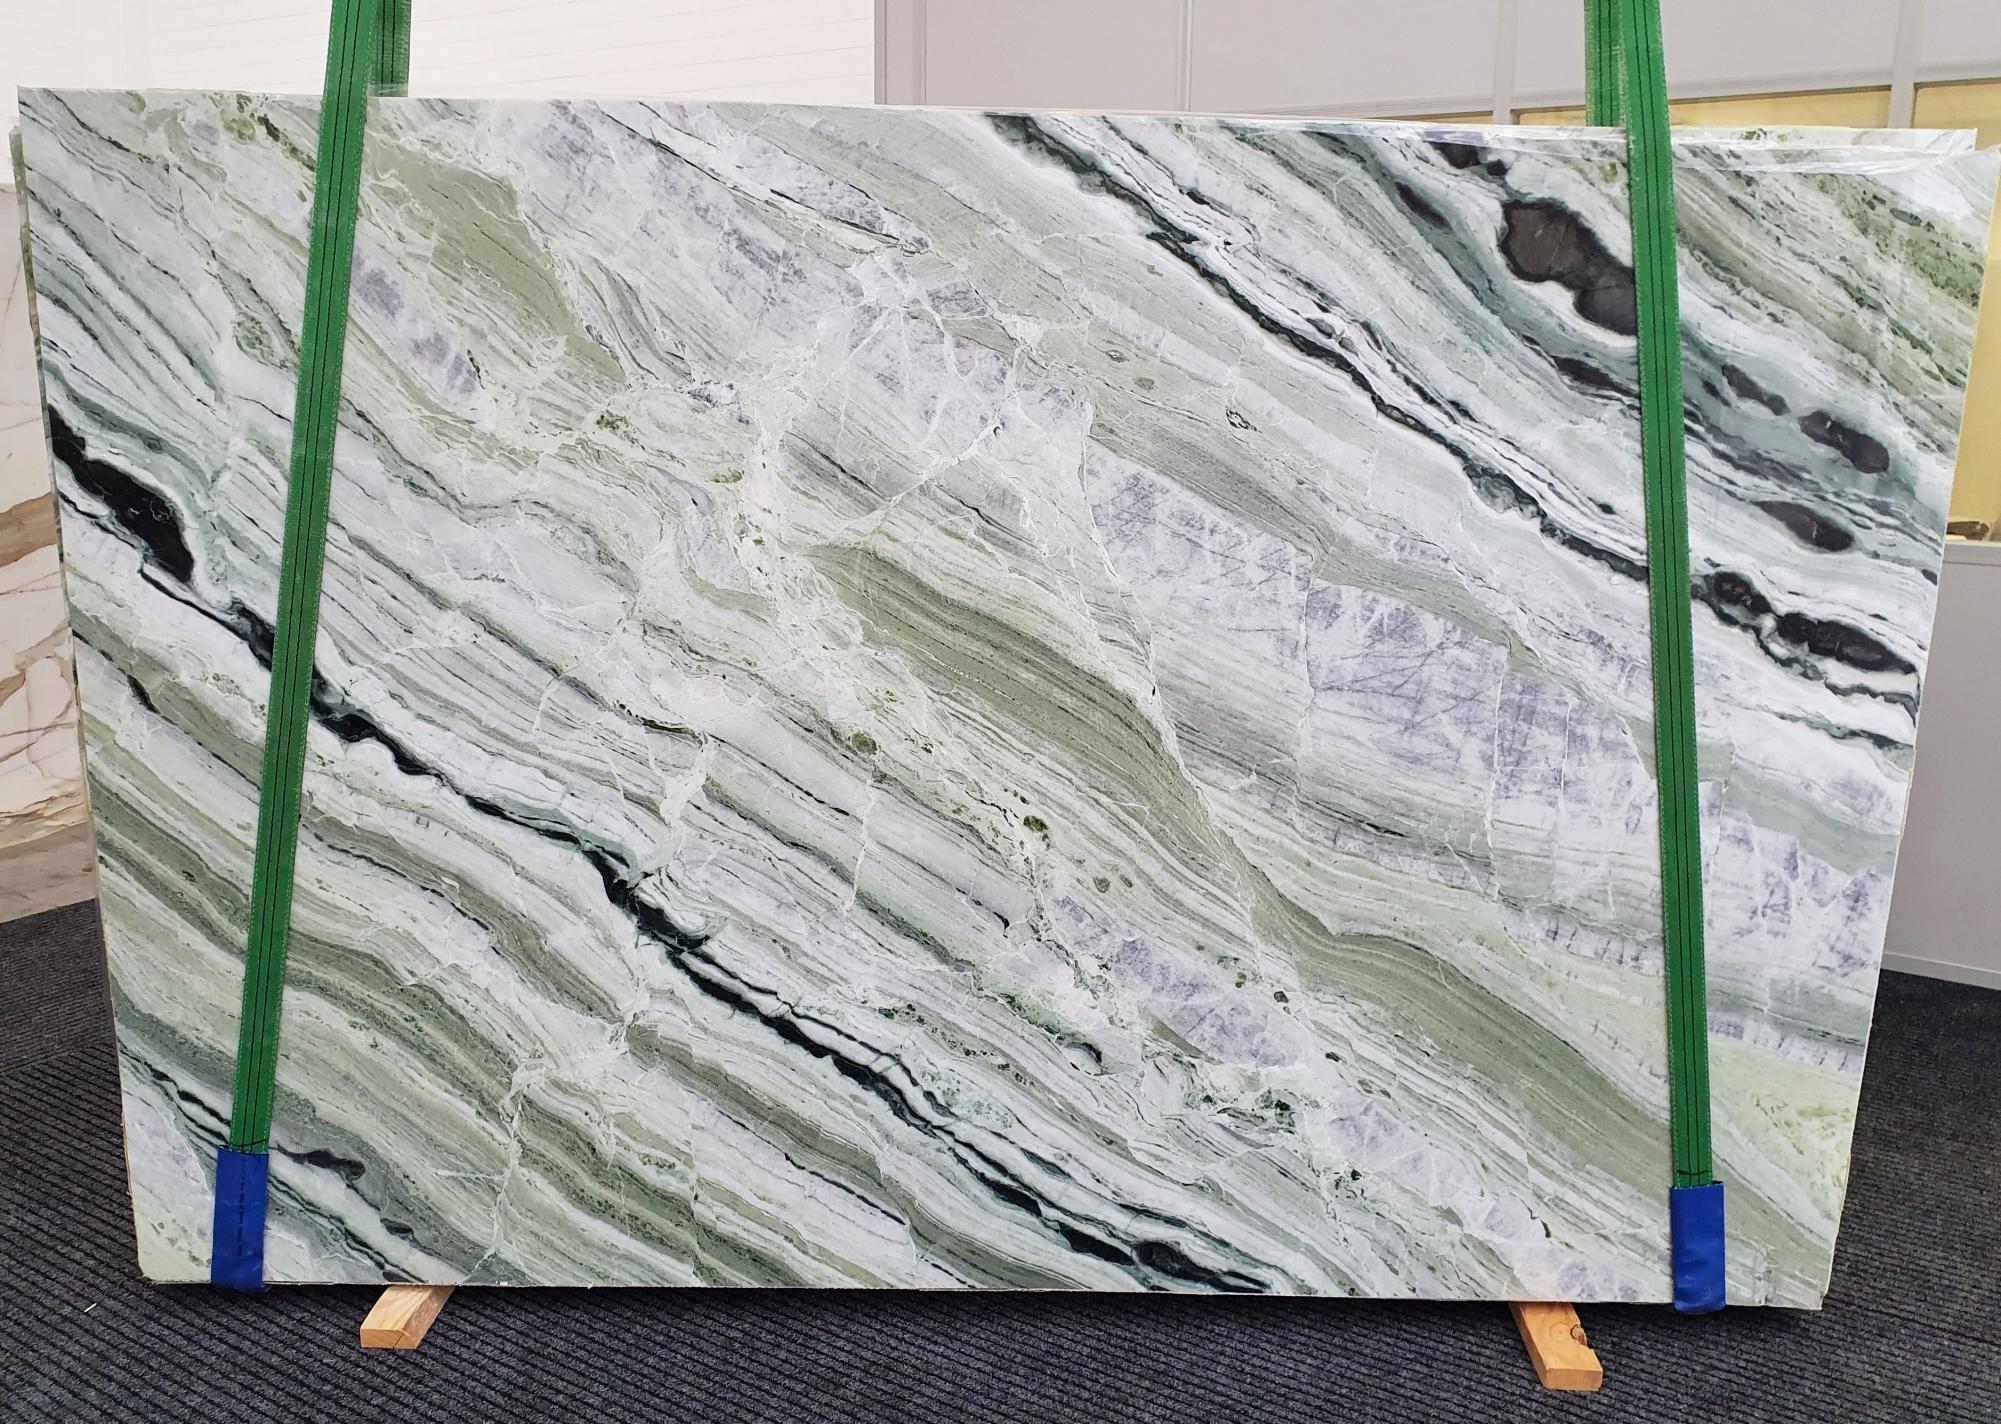 GREEN BEAUTY Supply Veneto (Italy) polished slabs 1452 , Slab #01 natural marble